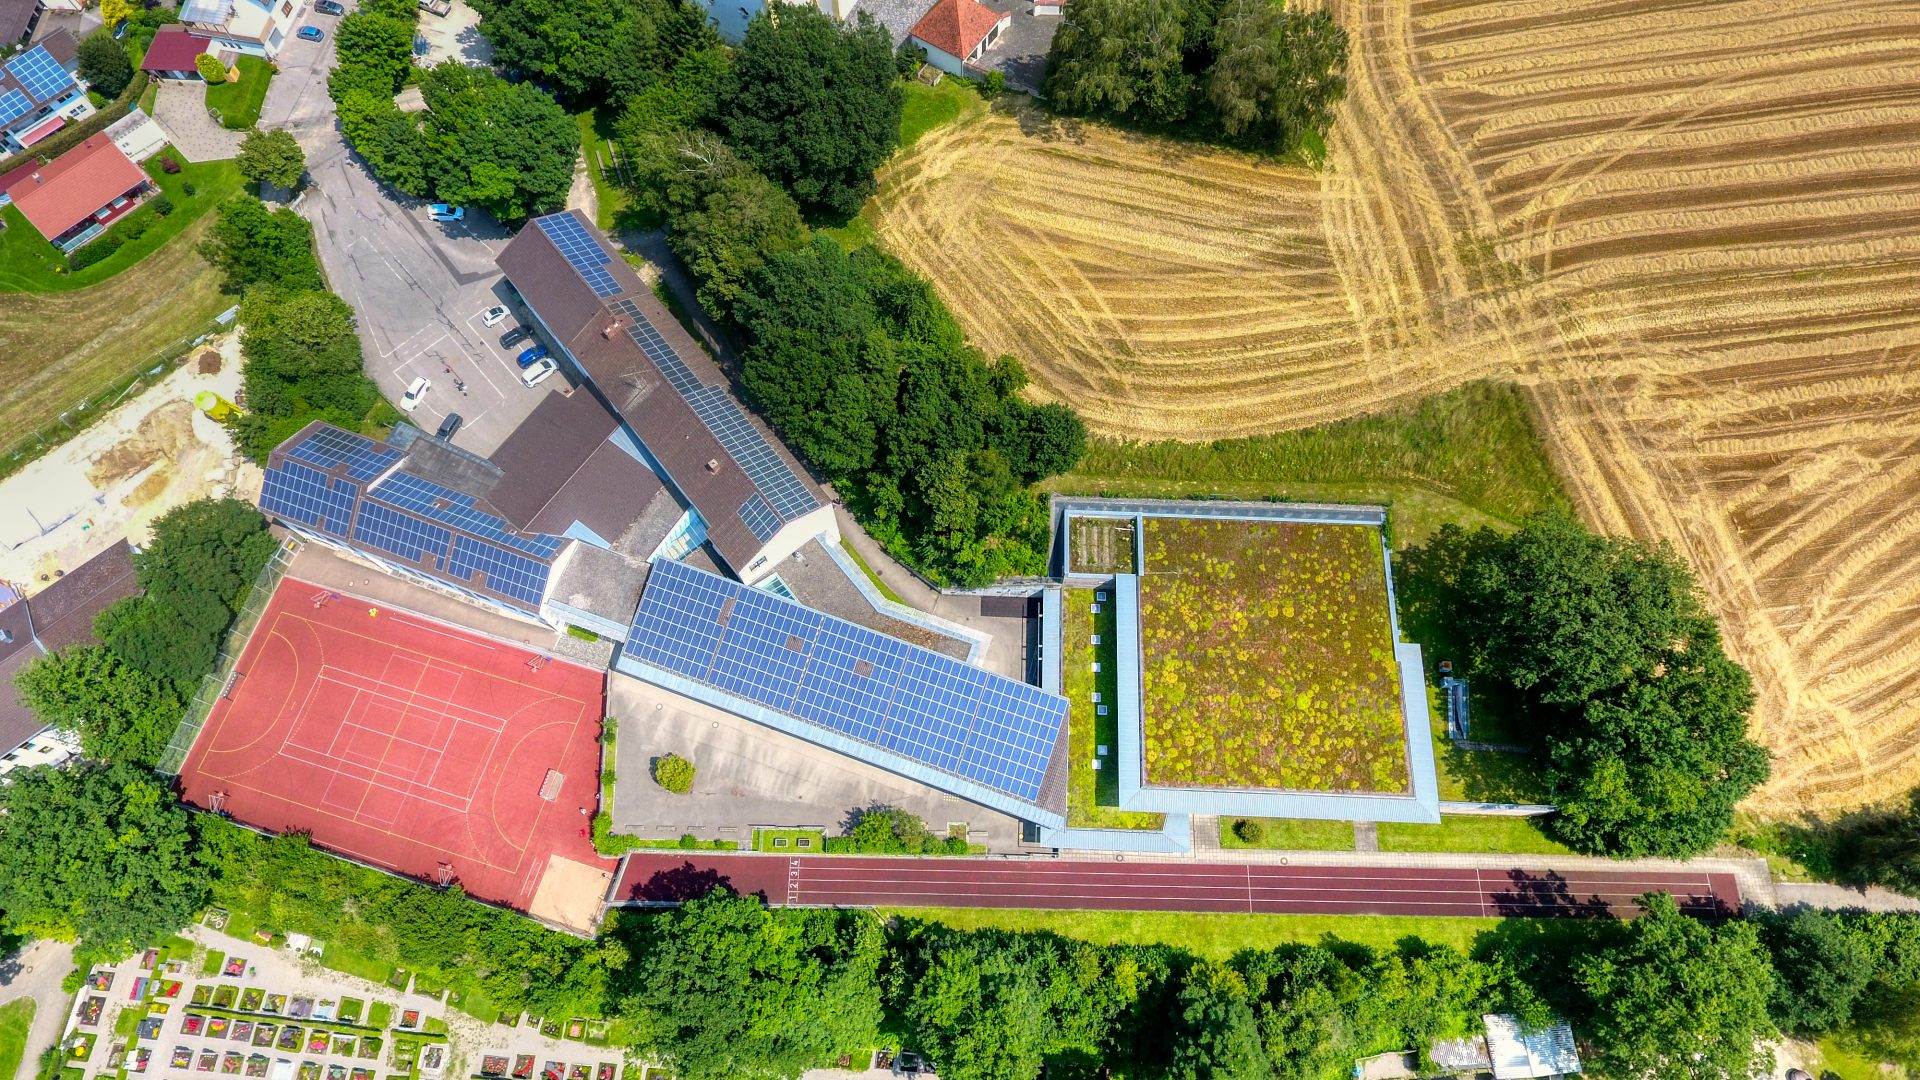 Luftbild Schule Biberbach Foto: Sascha Oberman